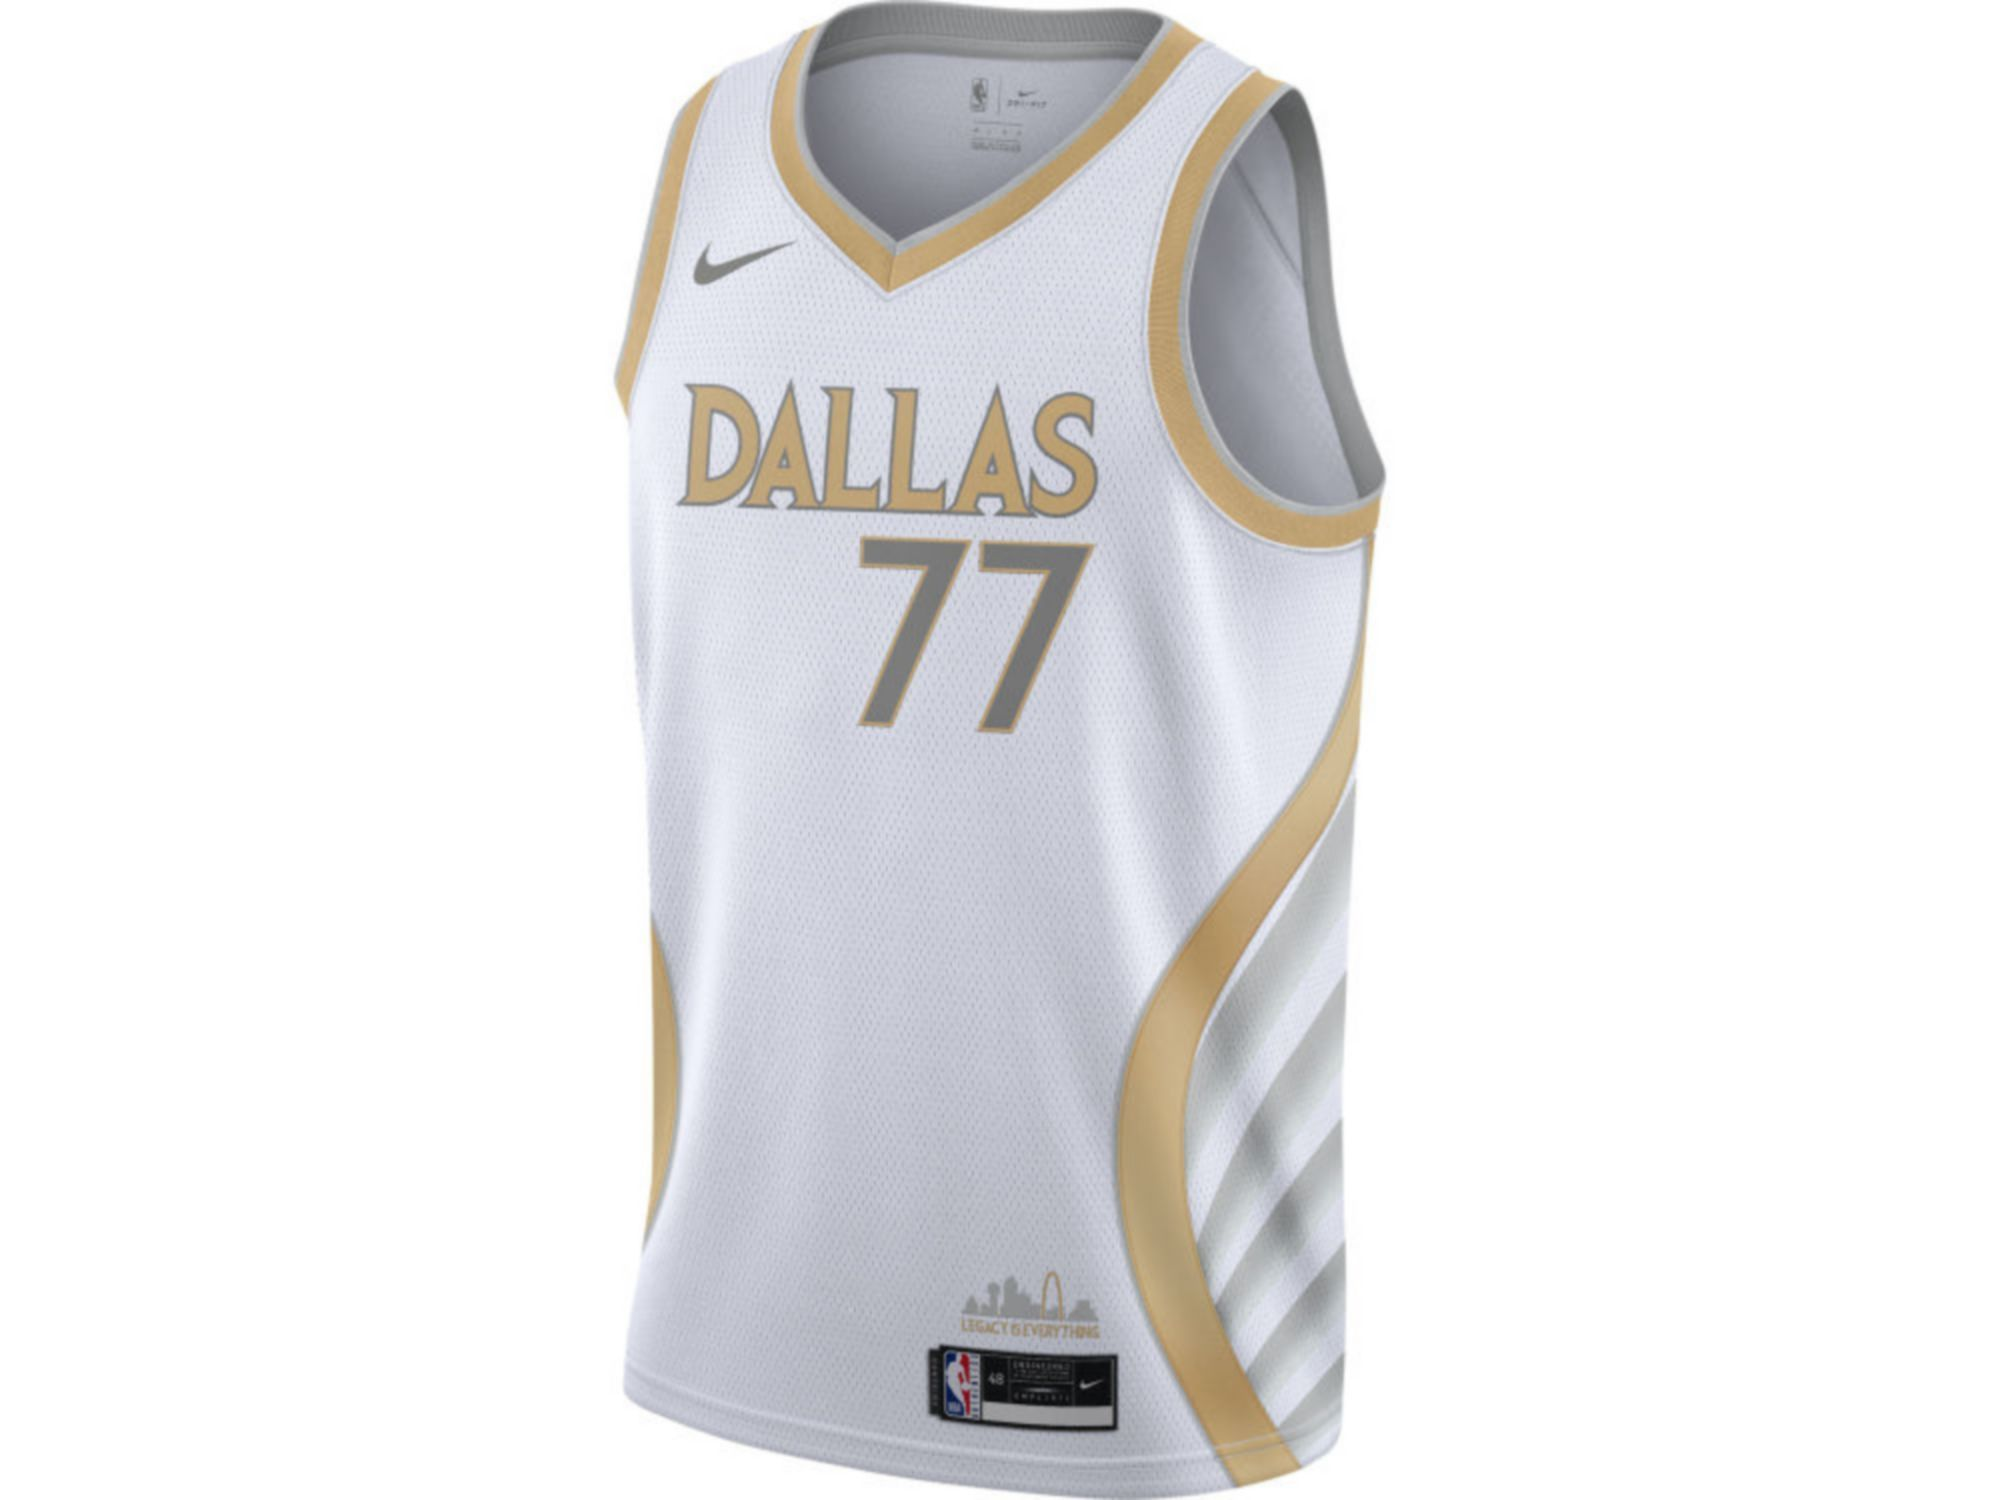 Nike Dallas Mavericks Men's City Edition Swingman Jersey - Luka Doncic & Reviews - NBA - Sports Fan Shop - Macy's